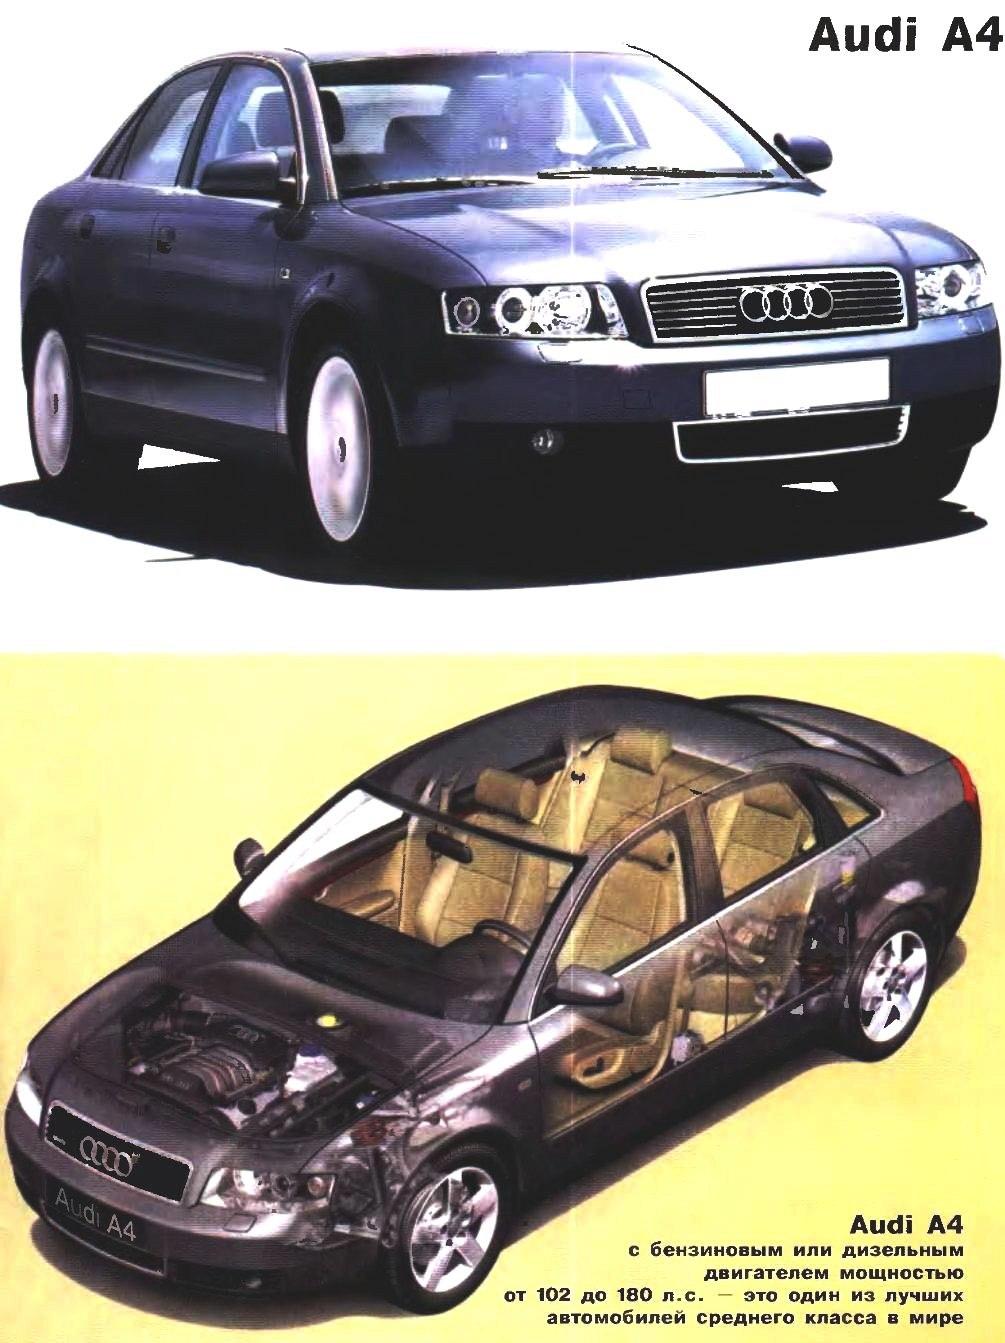 Middle class car AUDI A4